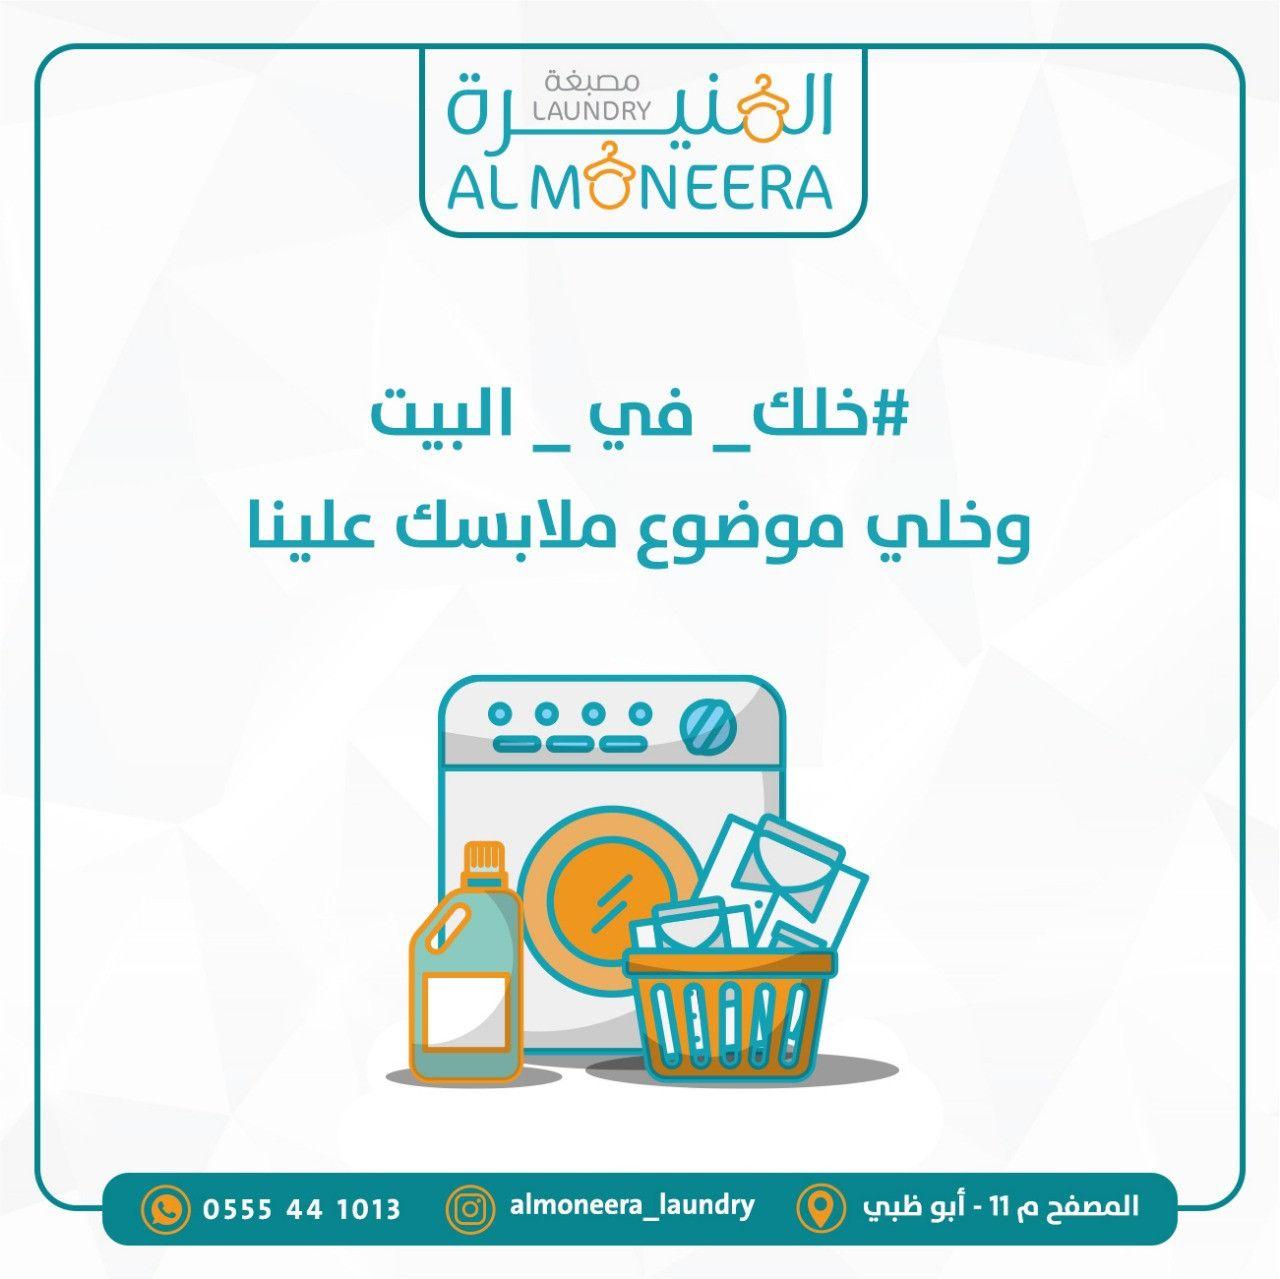 Almoneera Laundry 0